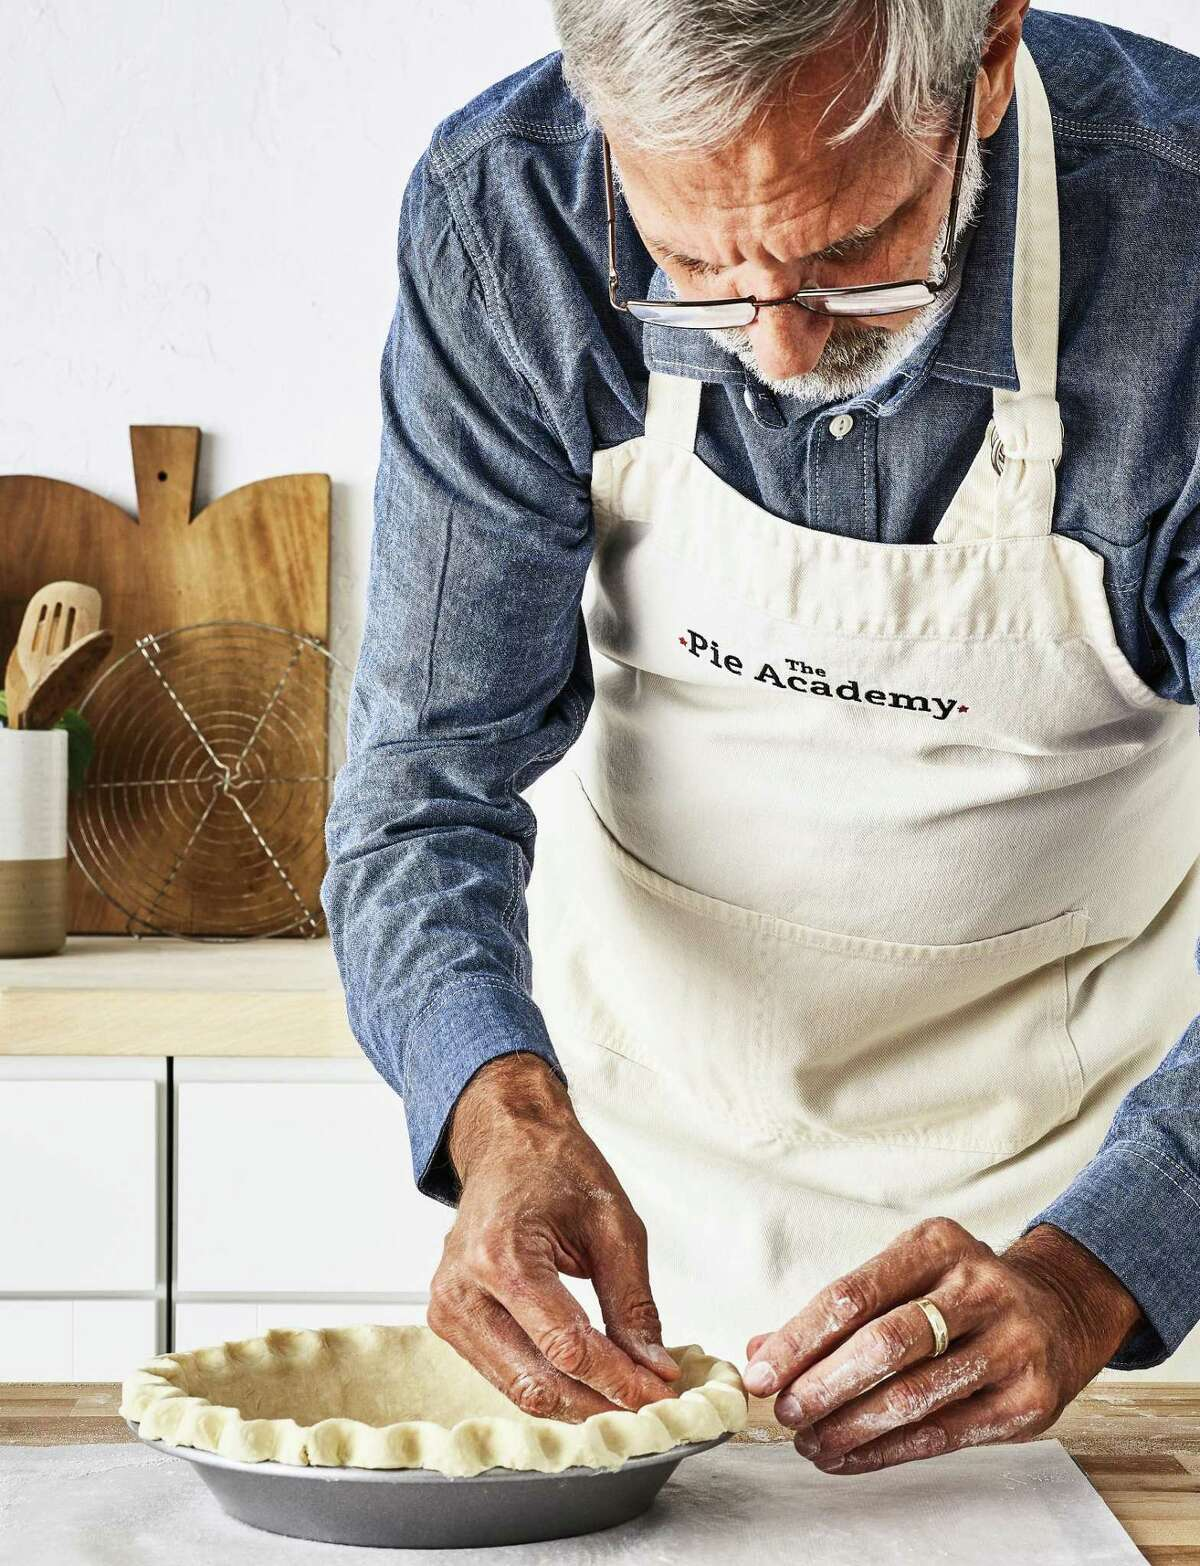 Ken Haedrich making a pie crust.